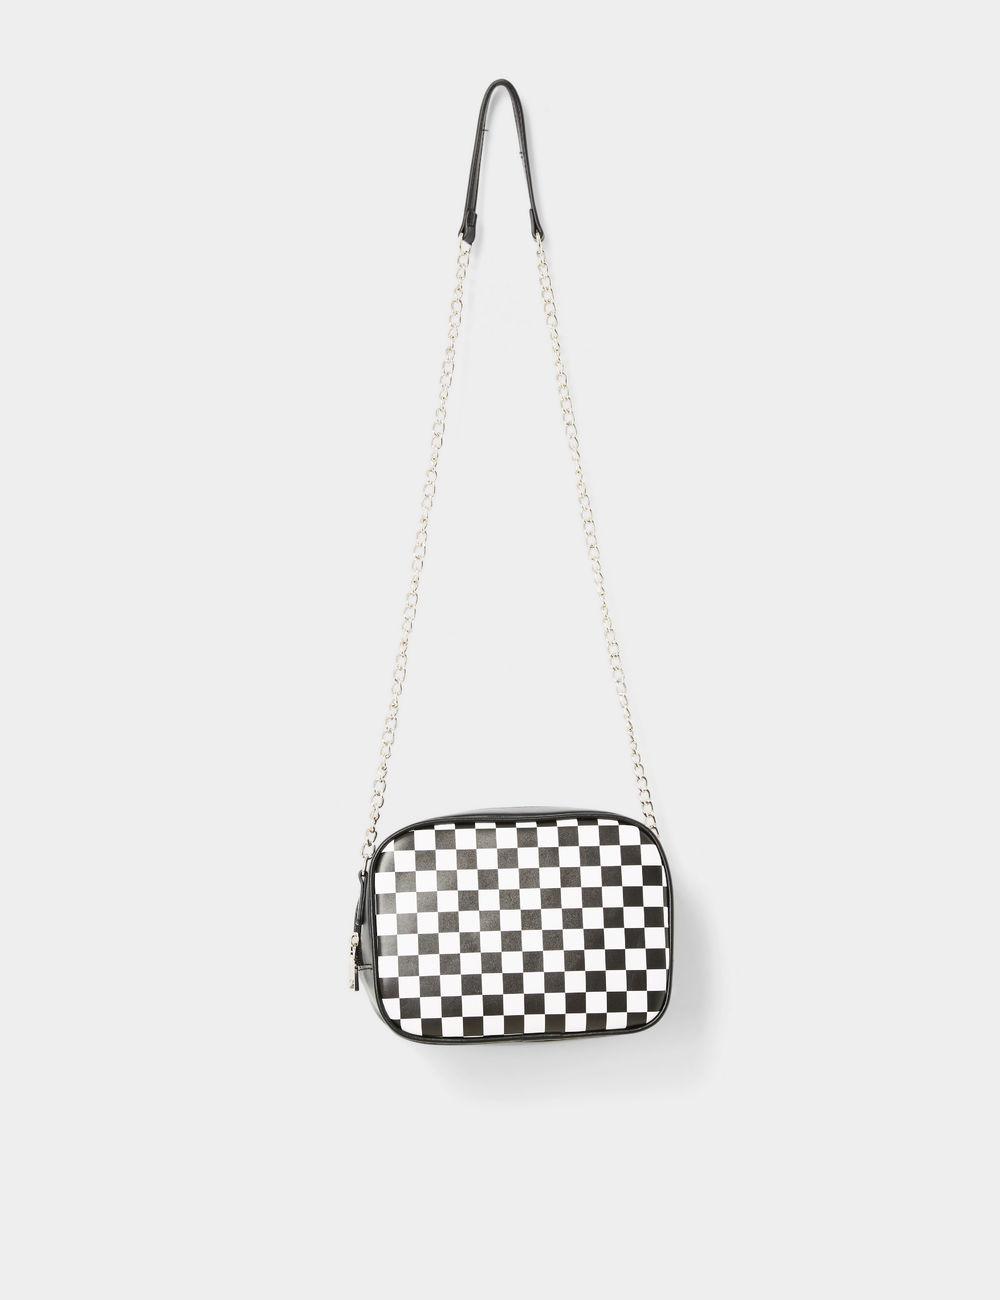 sac damier noir et blanc Jennyfer prix 16,99 €